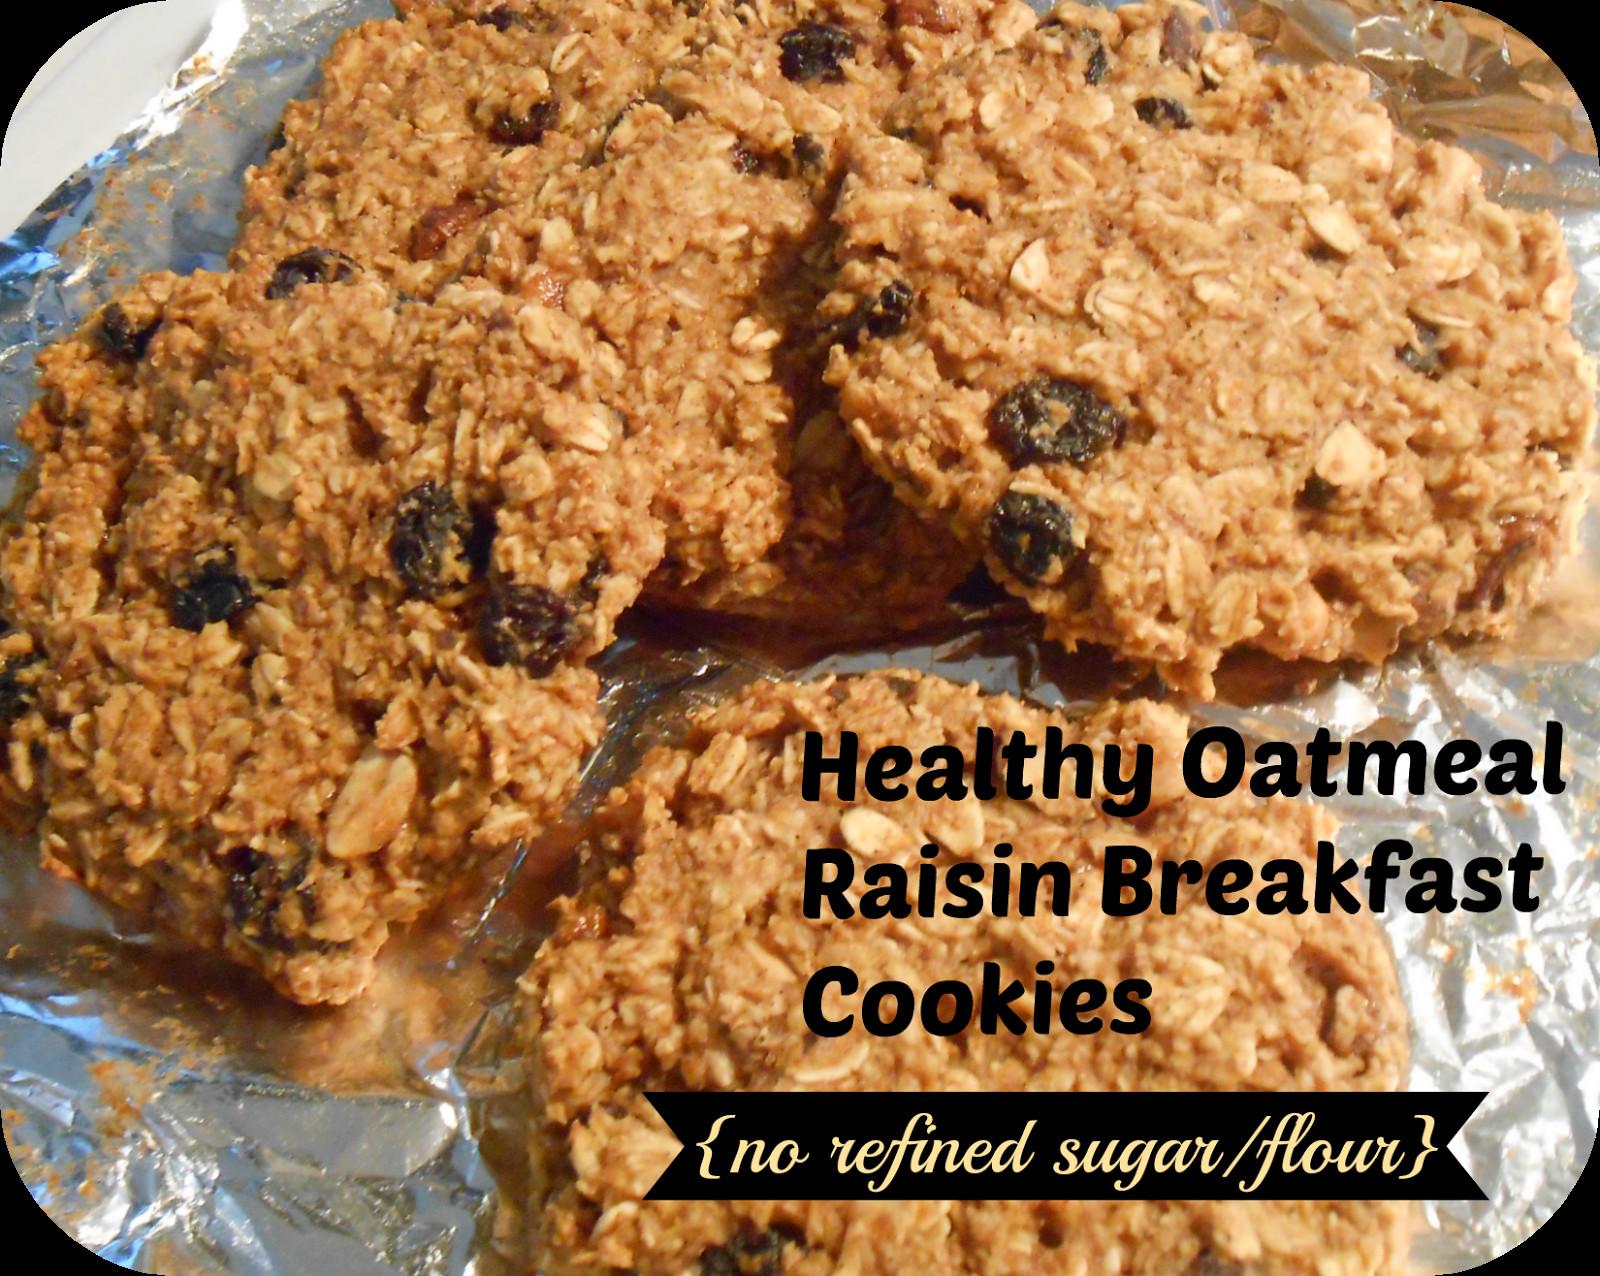 Healthy Oatmeal Cookies No Flour  Healthy oatmeal raisin breakfast cookies no refined sugar